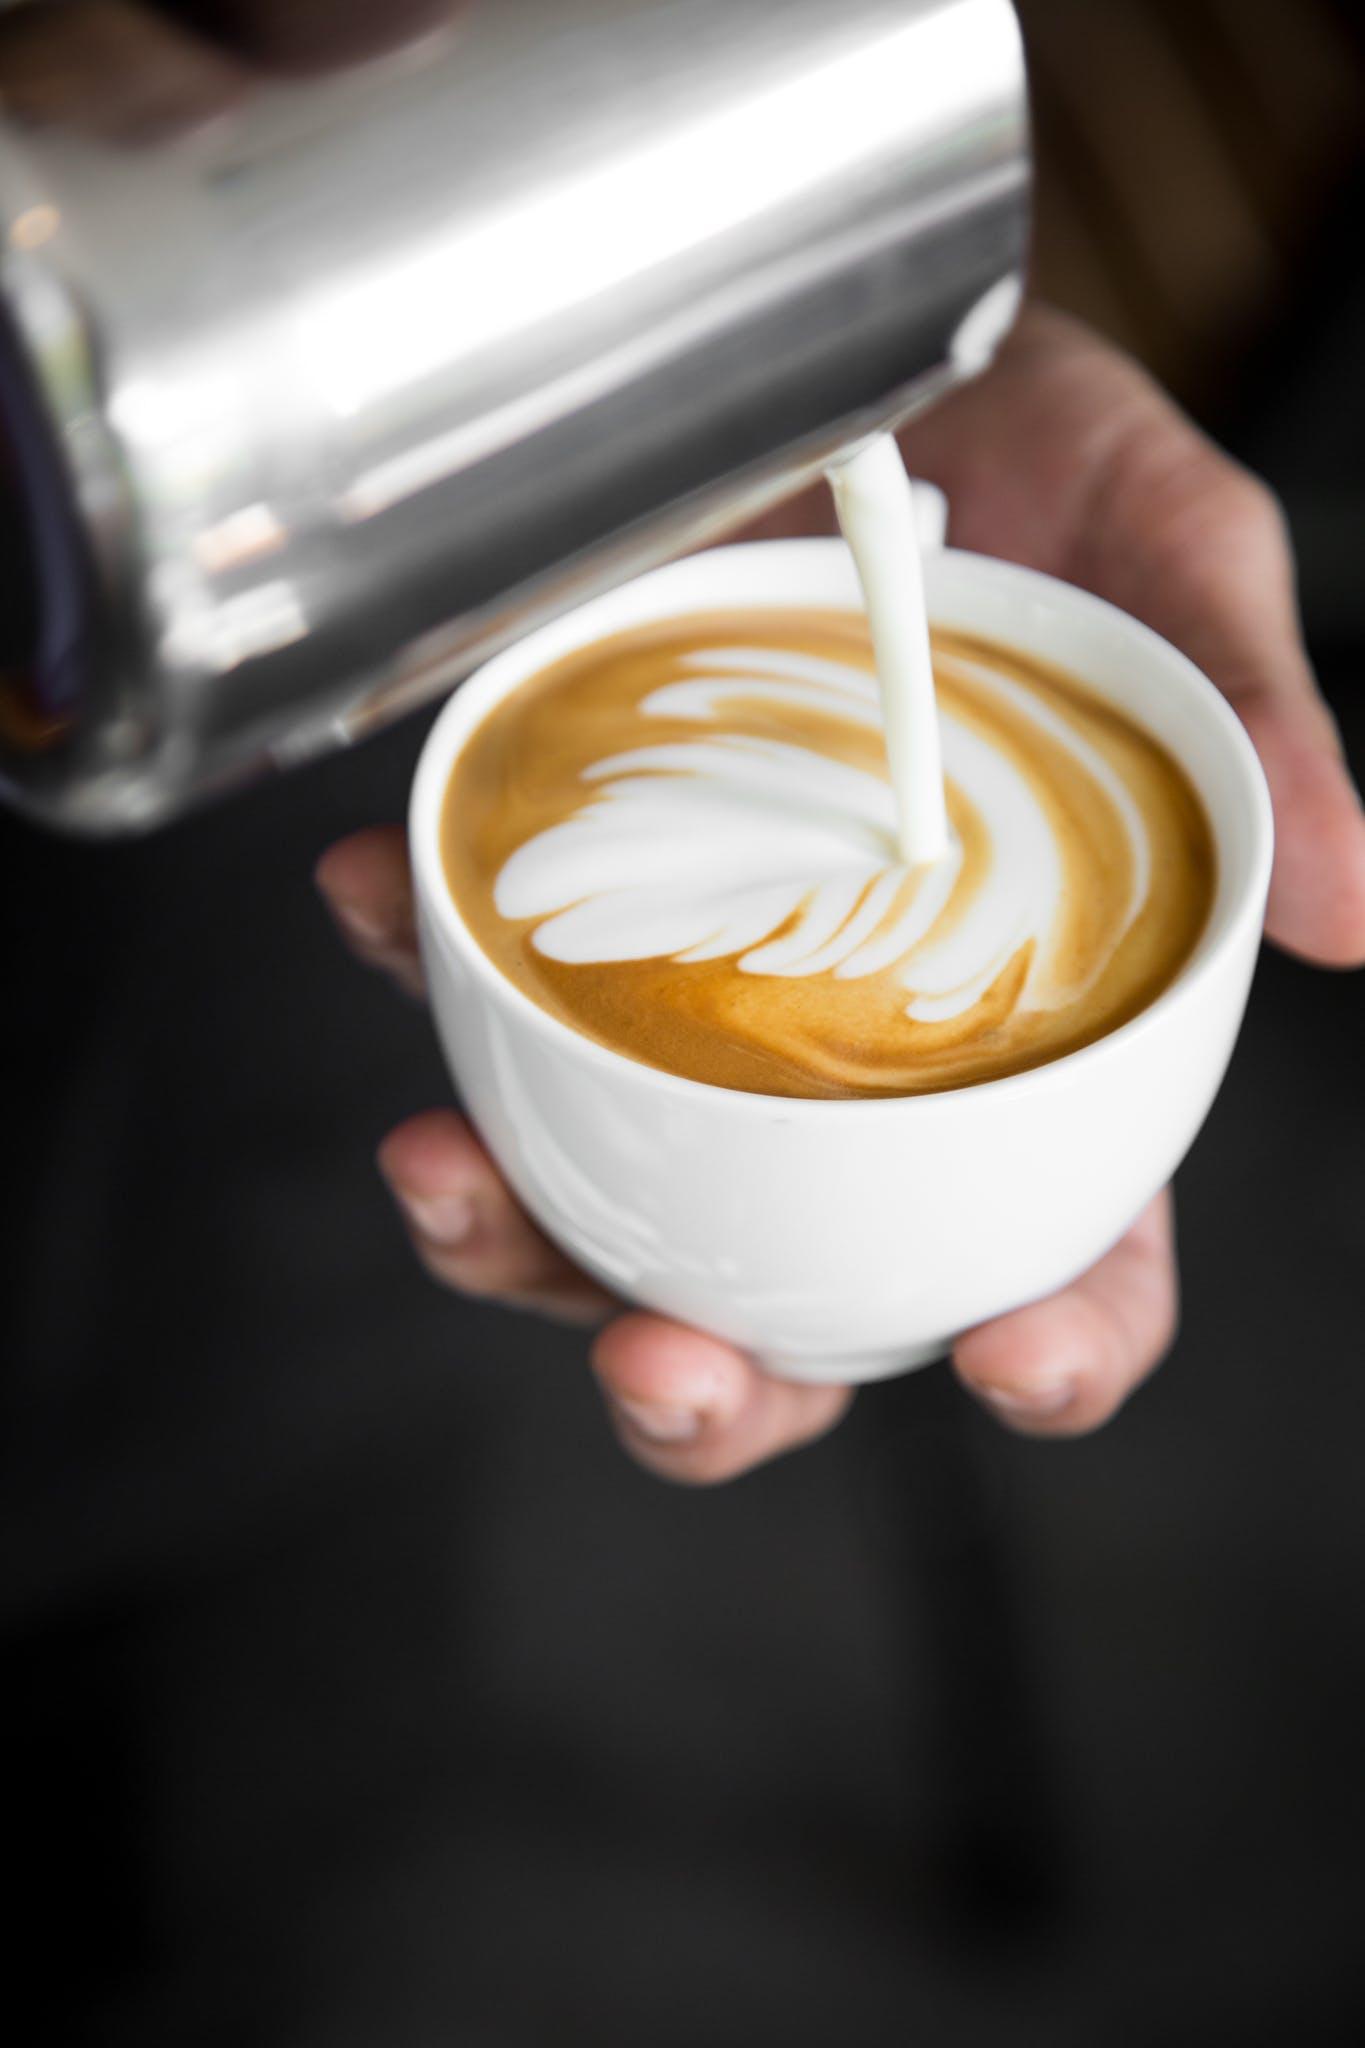 Latte In White Ceramic Cup